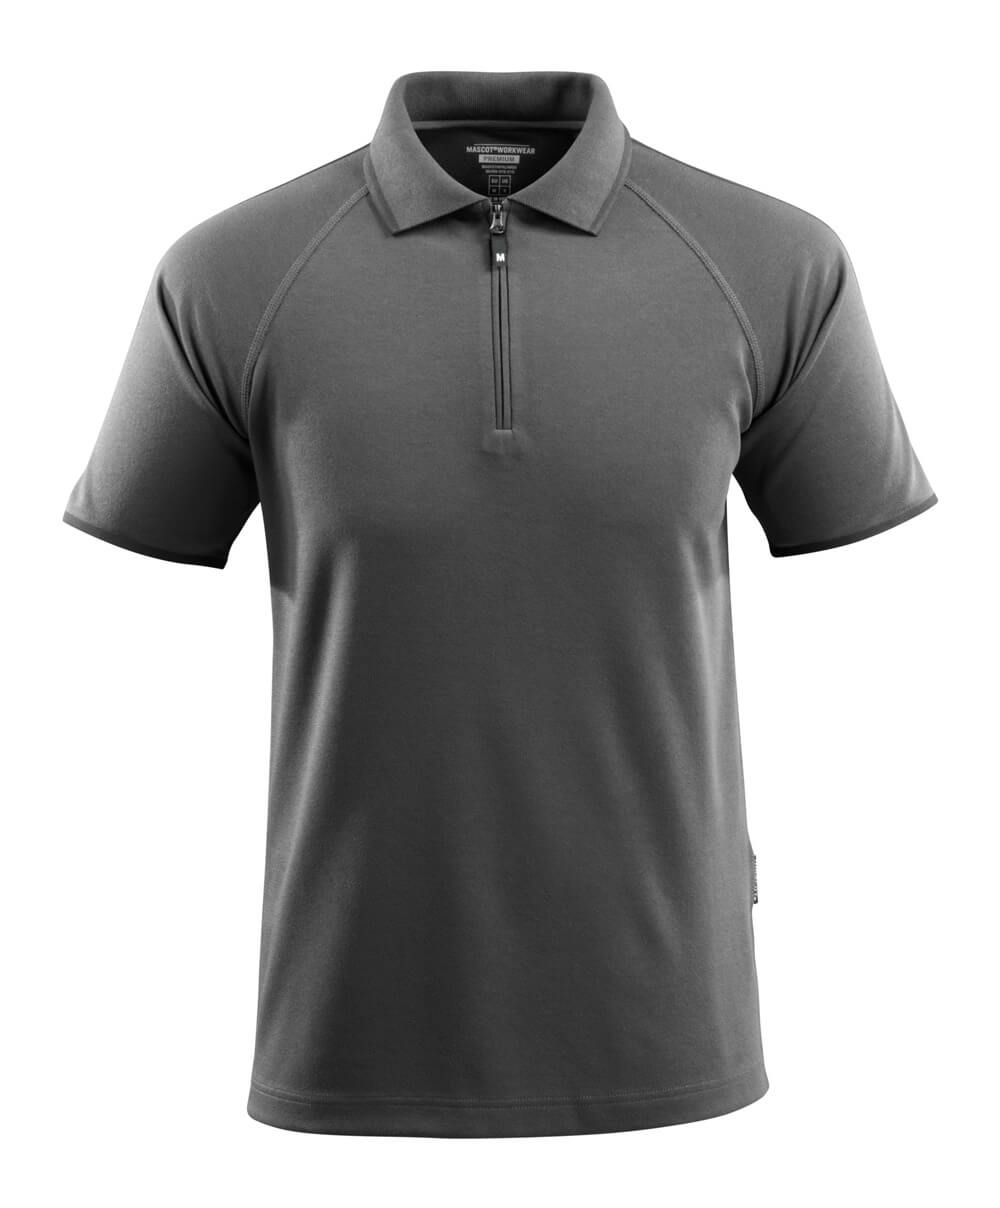 50458-978-18 Polo shirt - dark anthracite